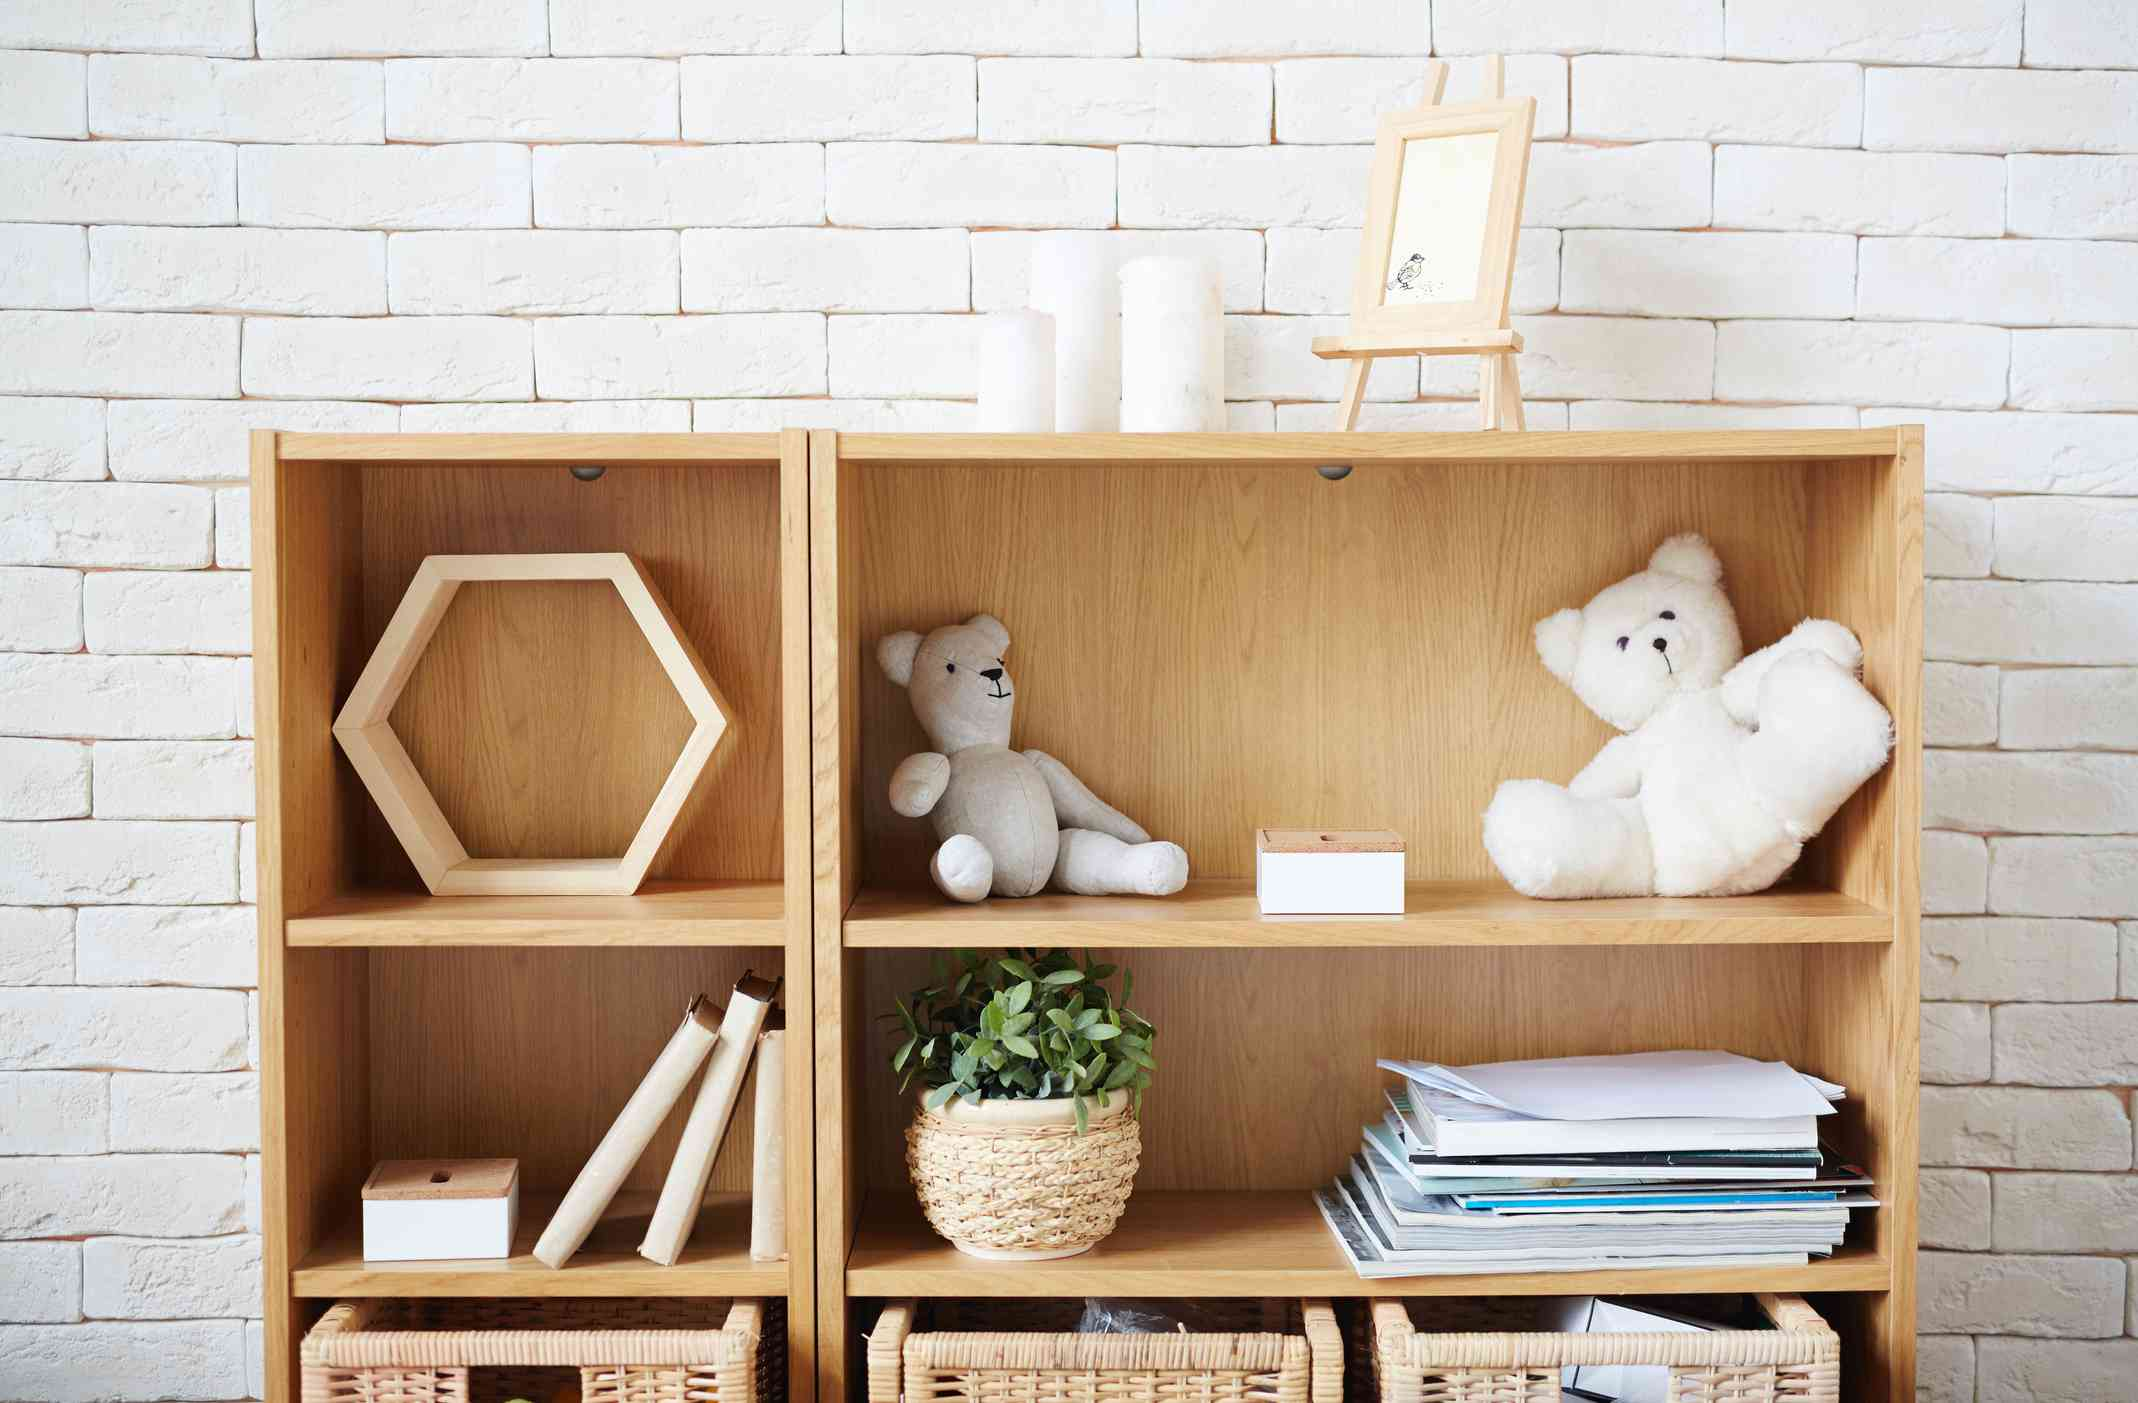 Shelf in room